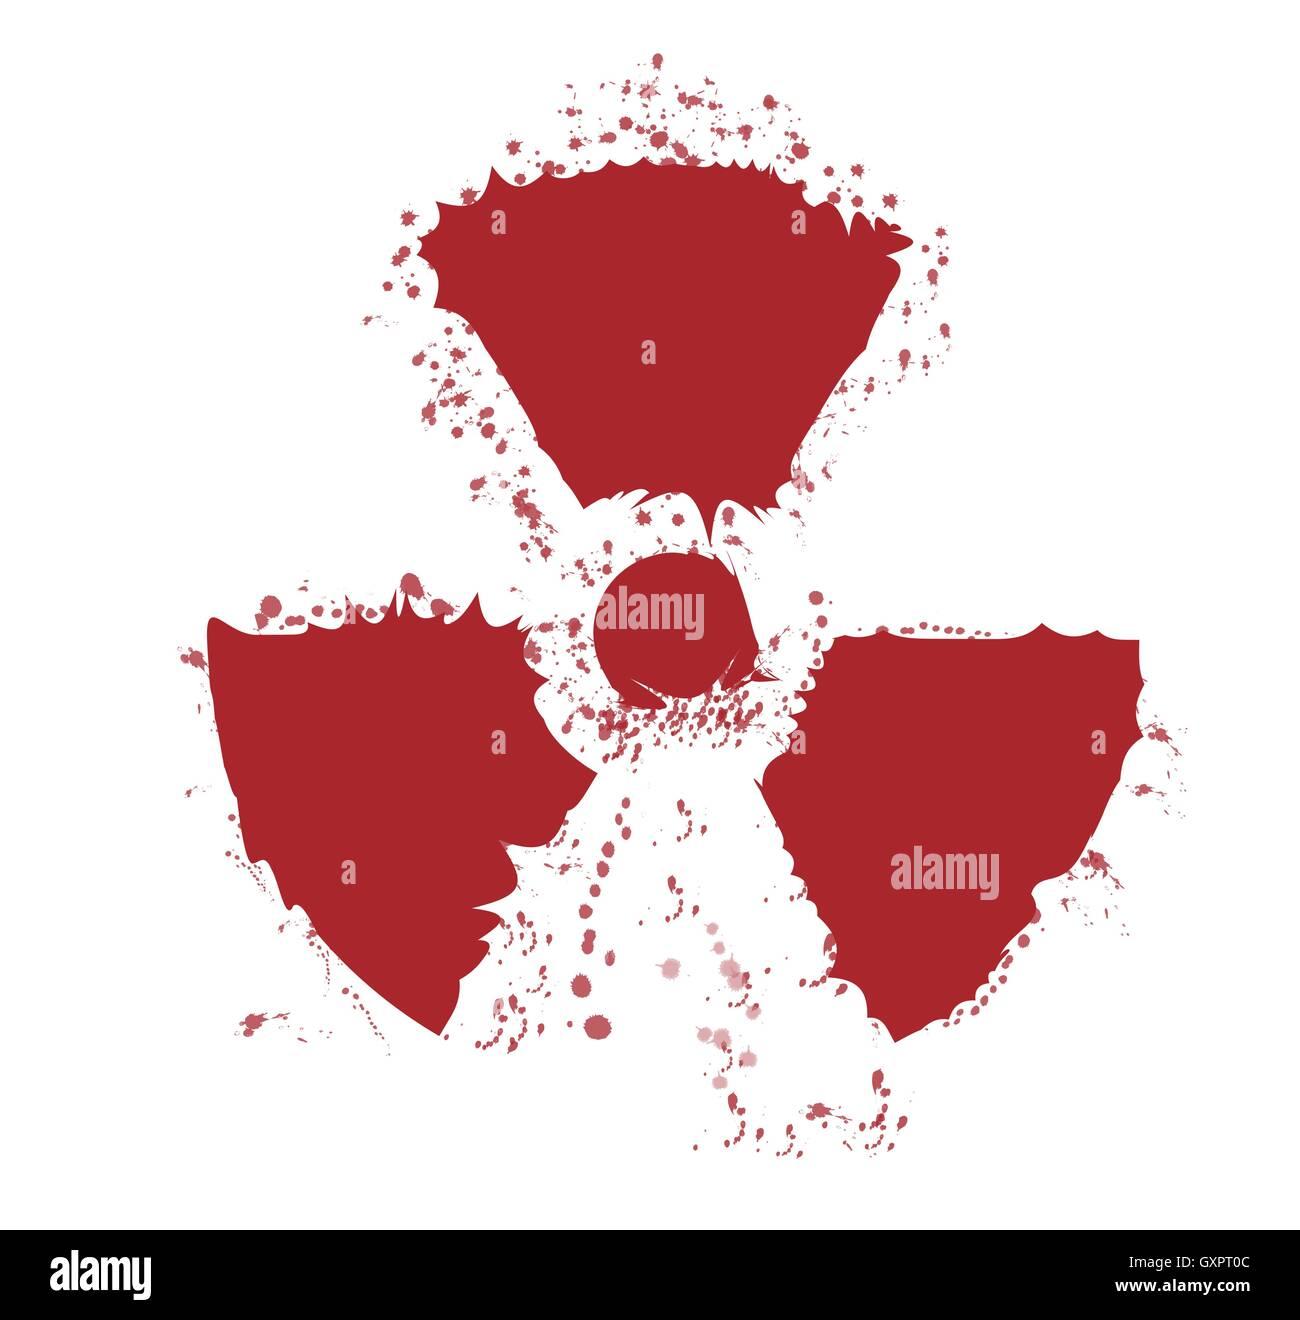 A worn Caution Radiation symbol in splatter red - Stock Vector